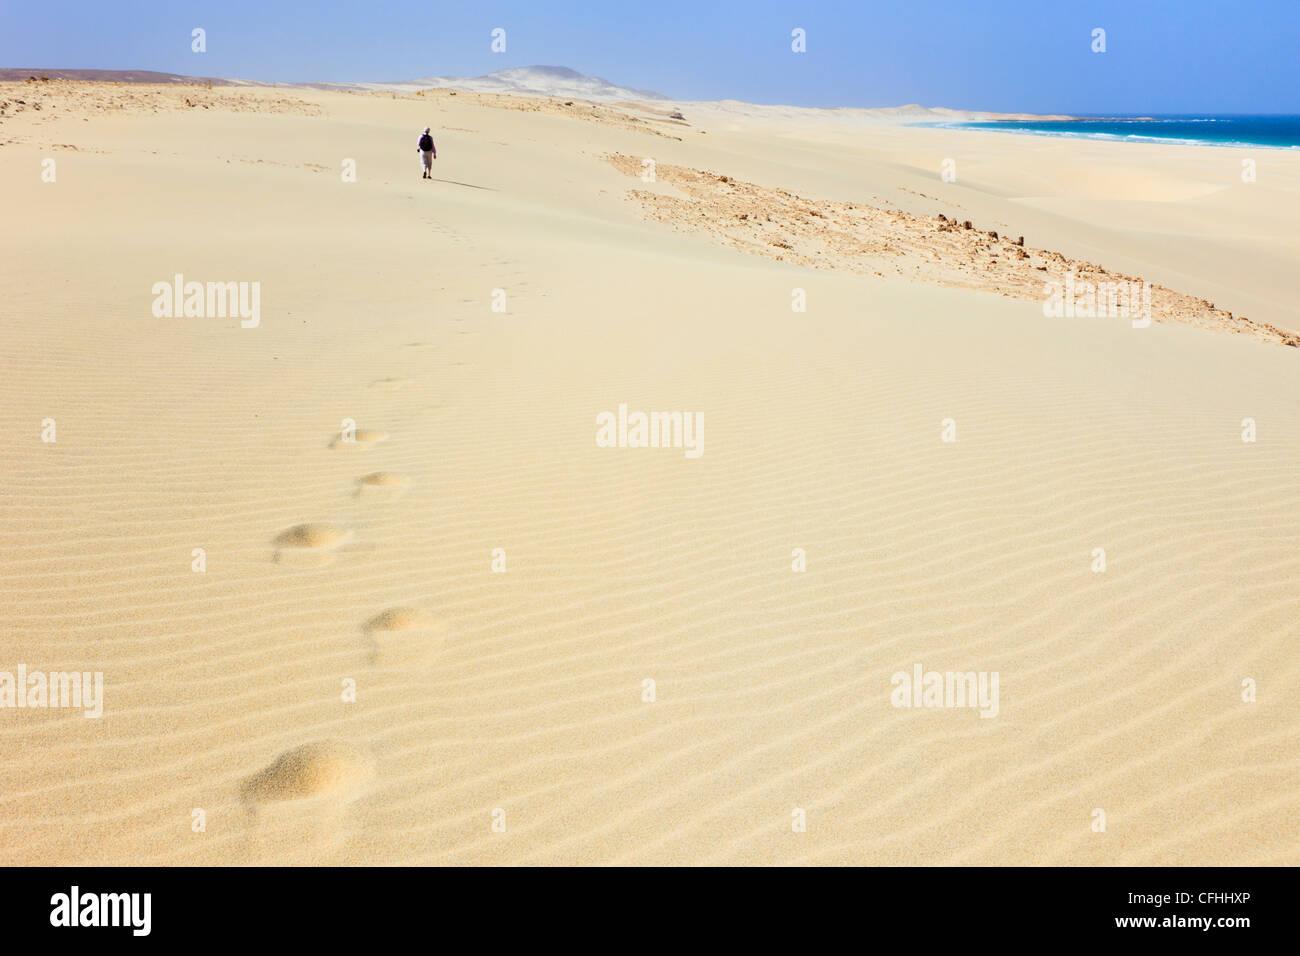 Person walking on sand dunes leaving footprints on white sandy beach of Praia de Chaves, Rabil, Boa Vista, Cape - Stock Image